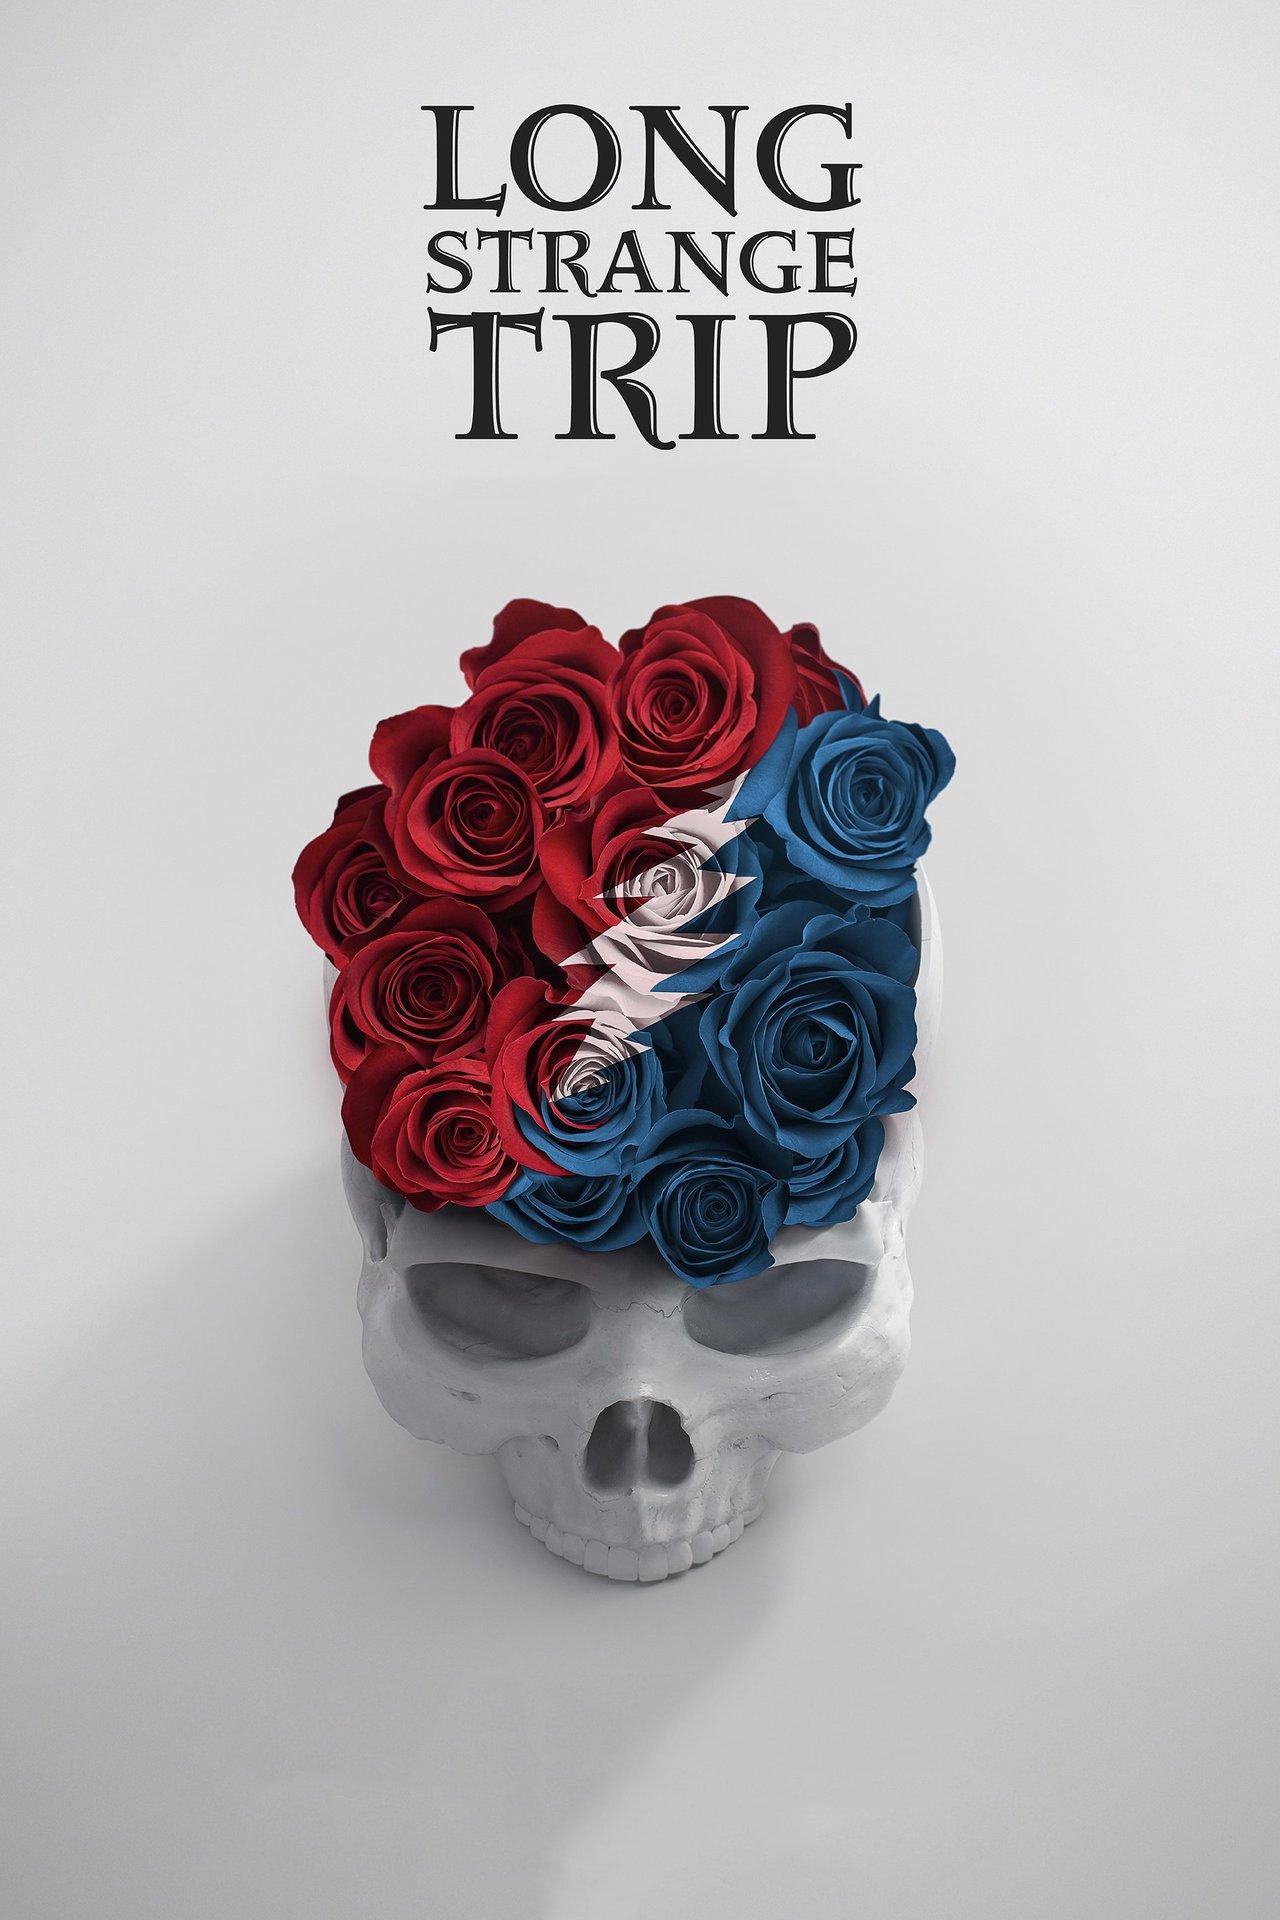 Long Strange Trip - Movie Poster